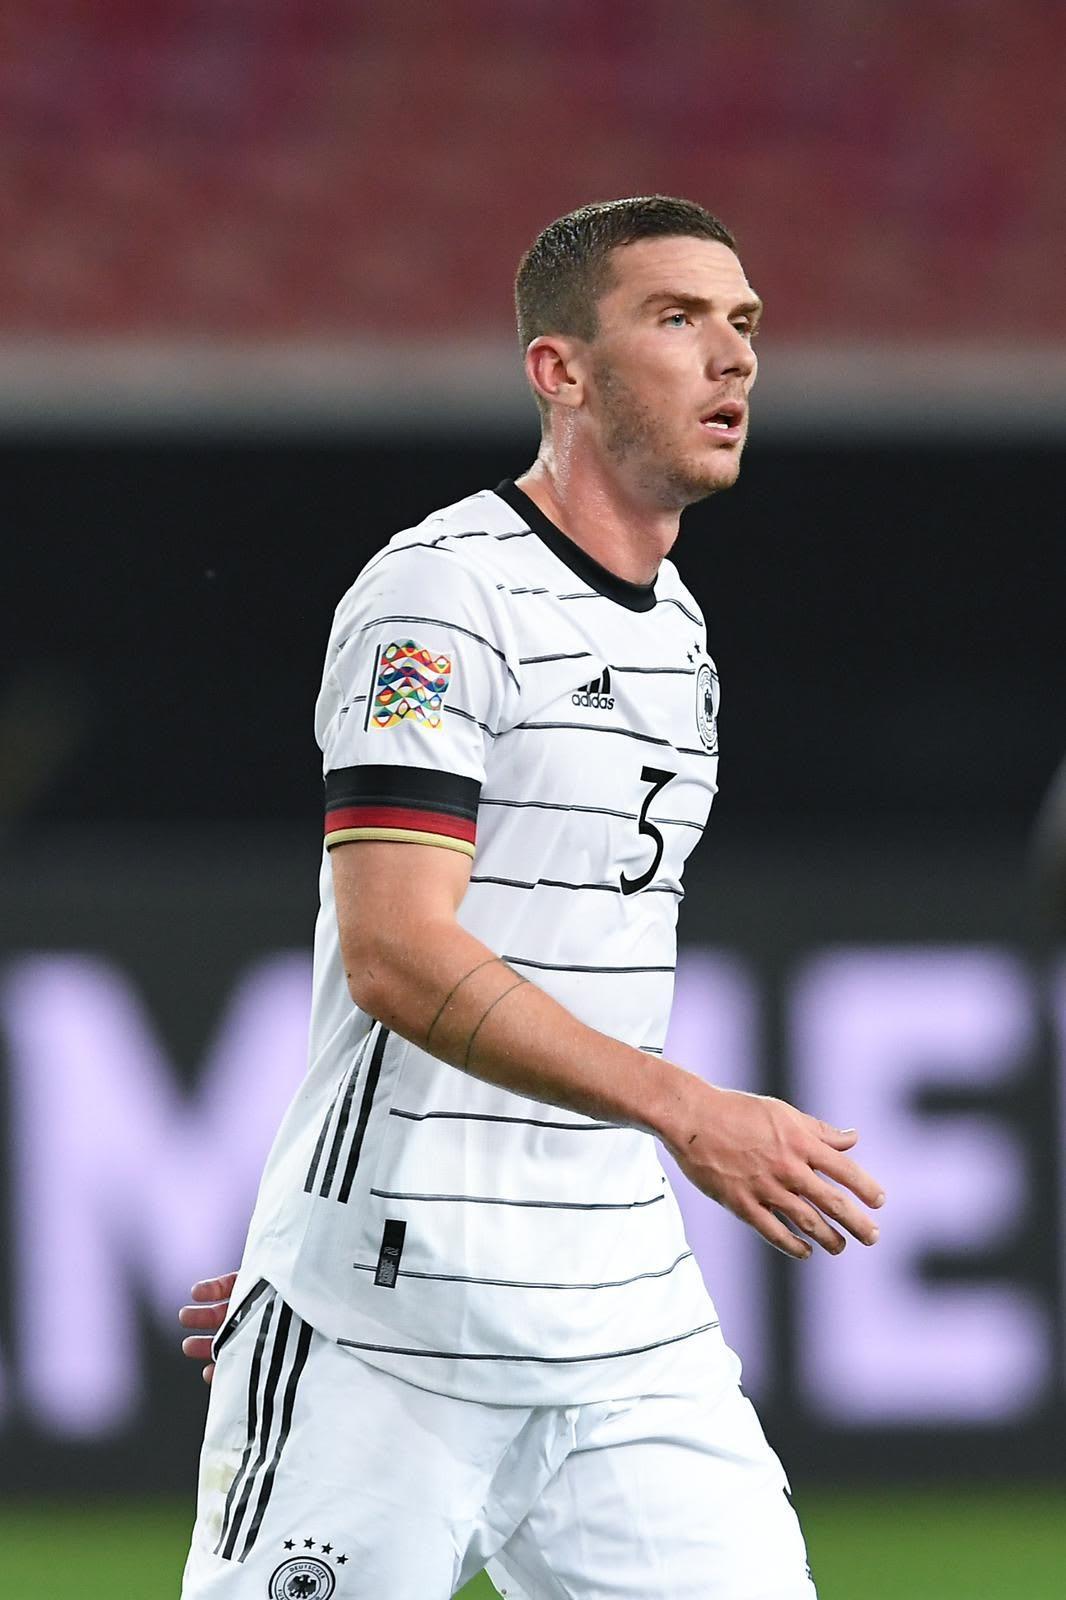 Caucasian man wearing white football jersey on a football pitch, Robin Gosens, footballer, football, German, Germany, team, adidas, sports, exercise, DFB